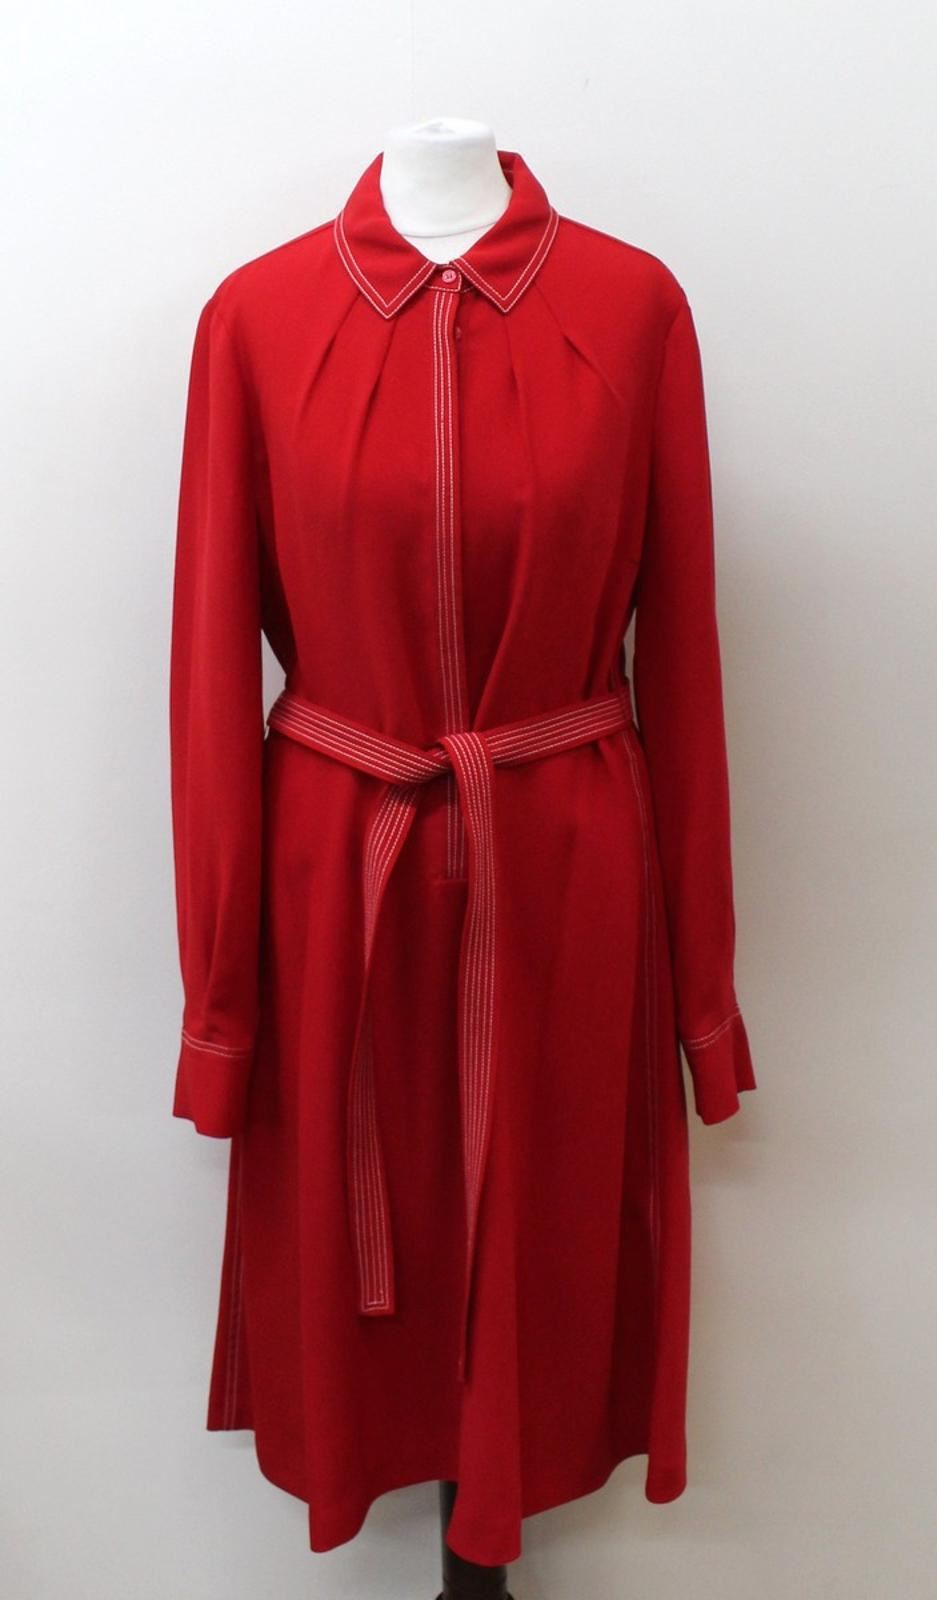 Hobbs-Damen-Tief-Rot-Langarm-Kragen-Nancy-Shirt-Kleid-uk12-eu40-NEU